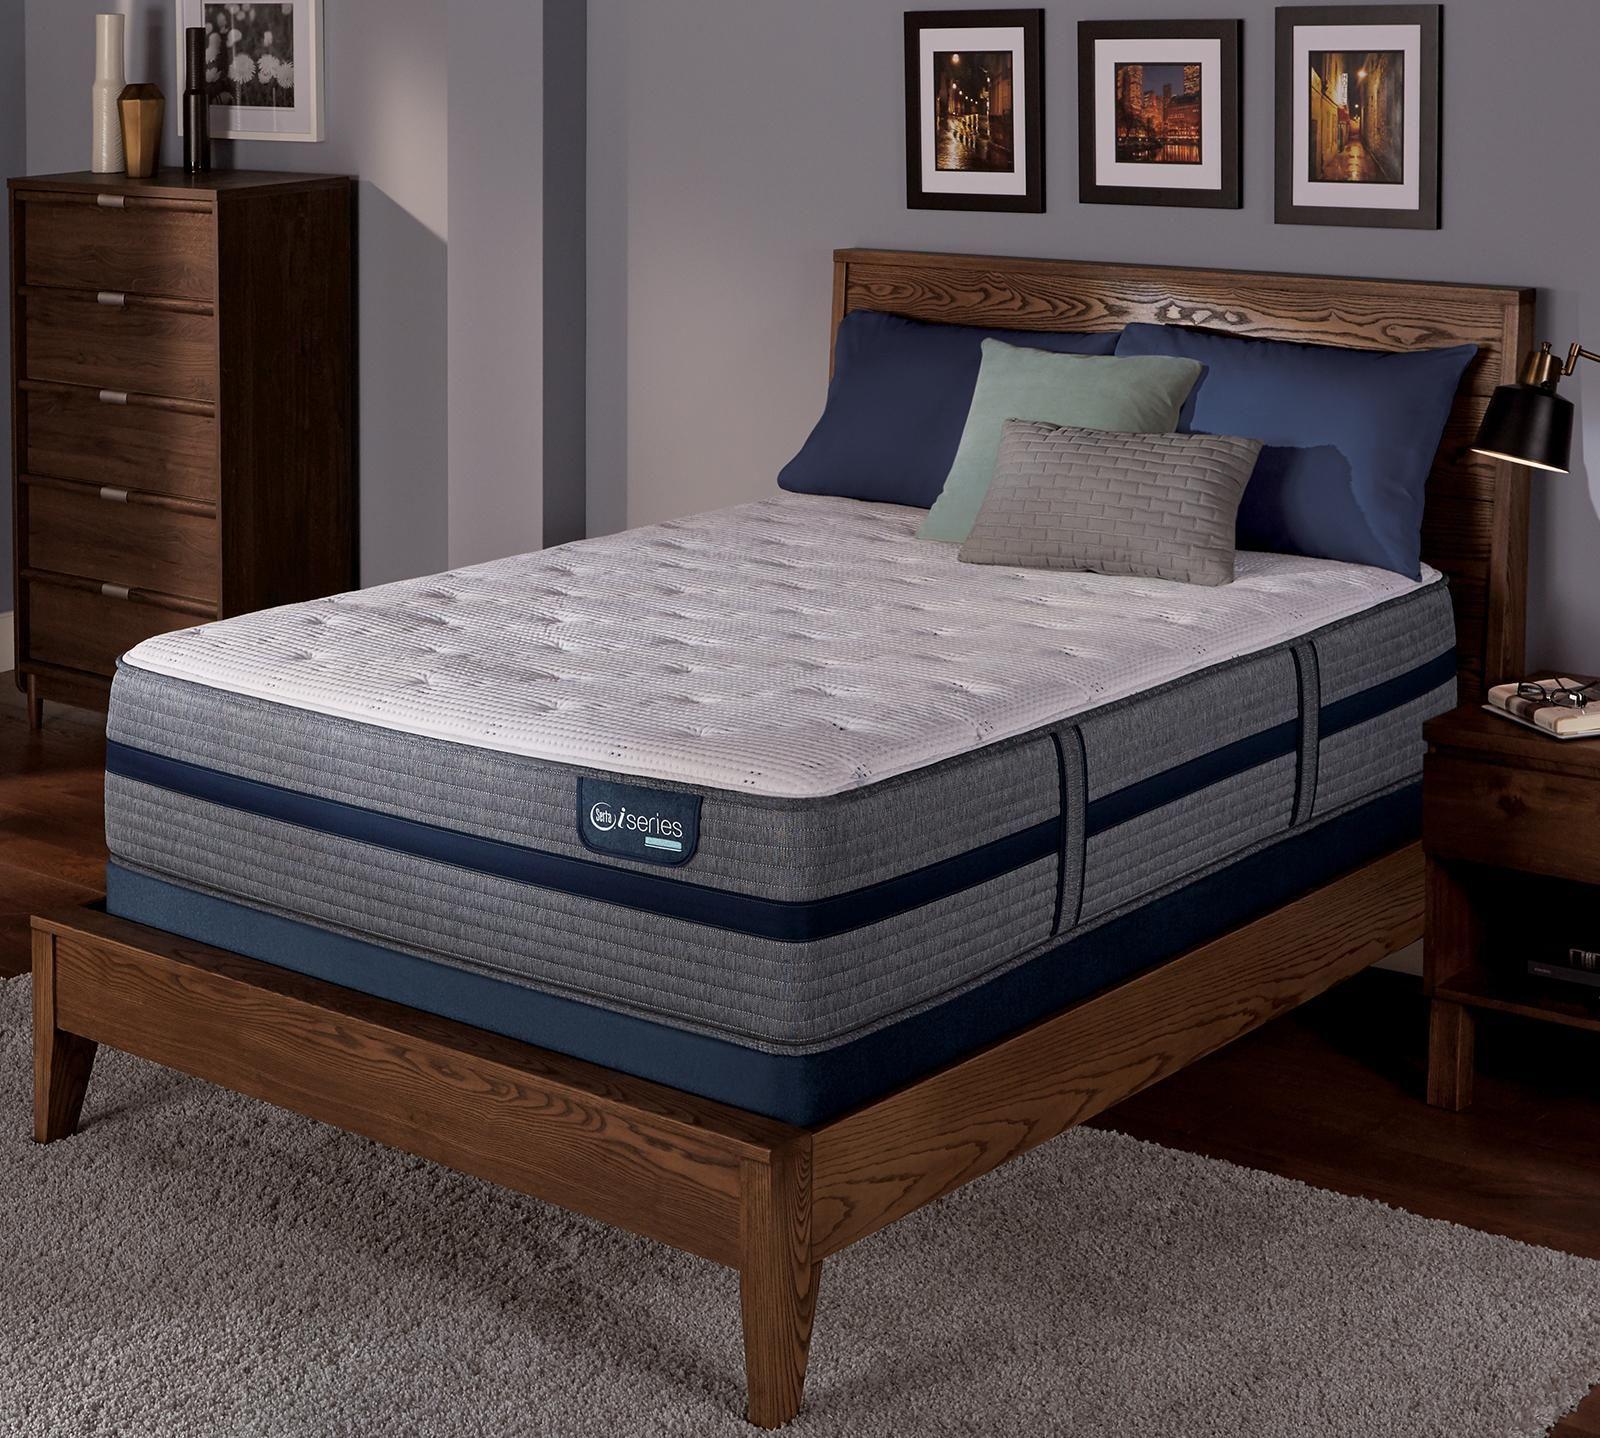 "iSeries Hybrid 300 13.5"" Plush Mattress Adjustable beds"